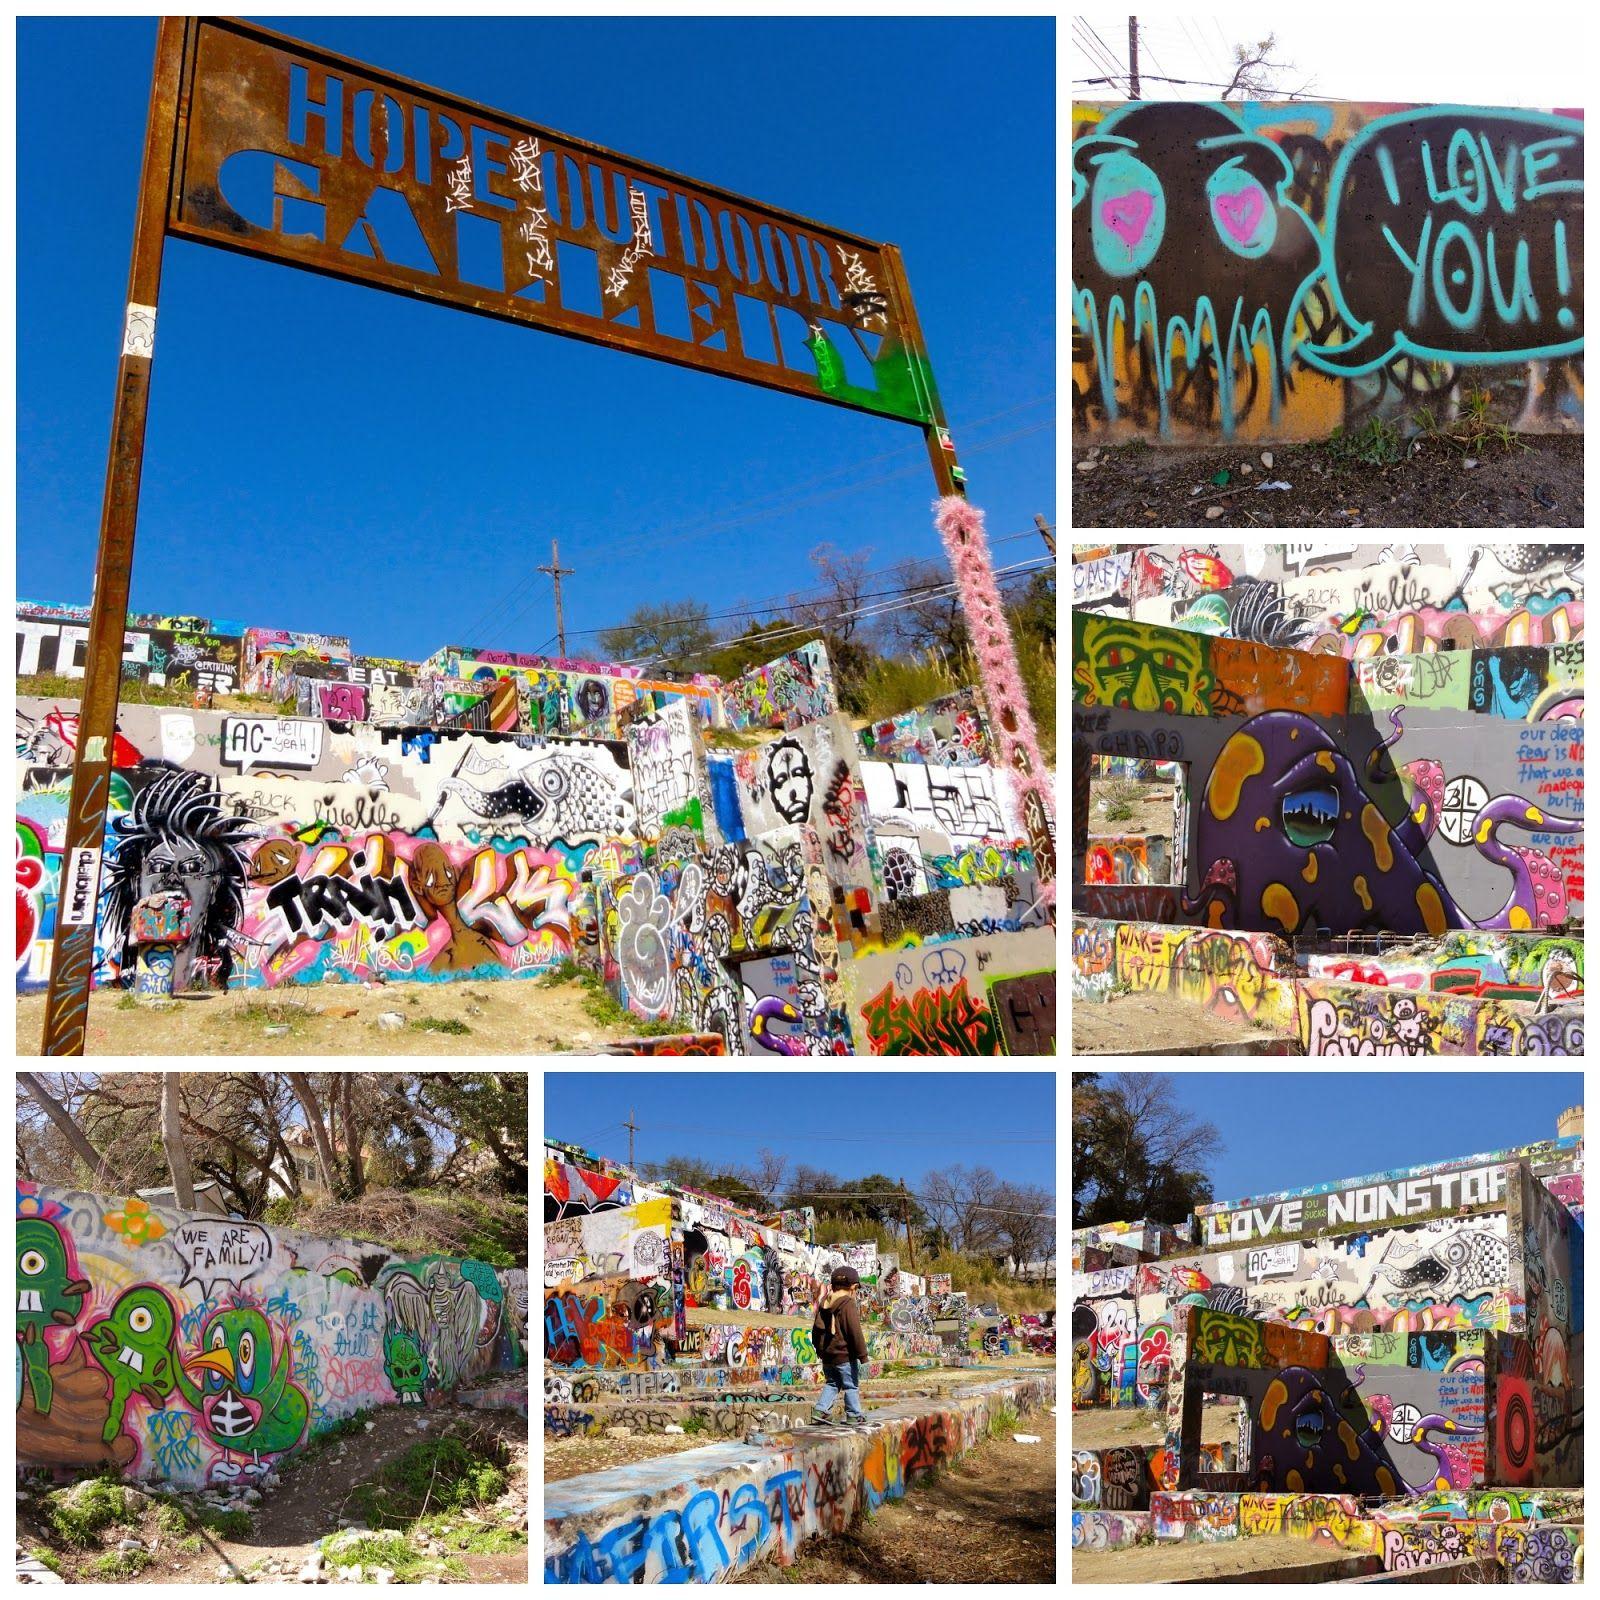 Free fun in austin exploring austin s street art murals mosaics http